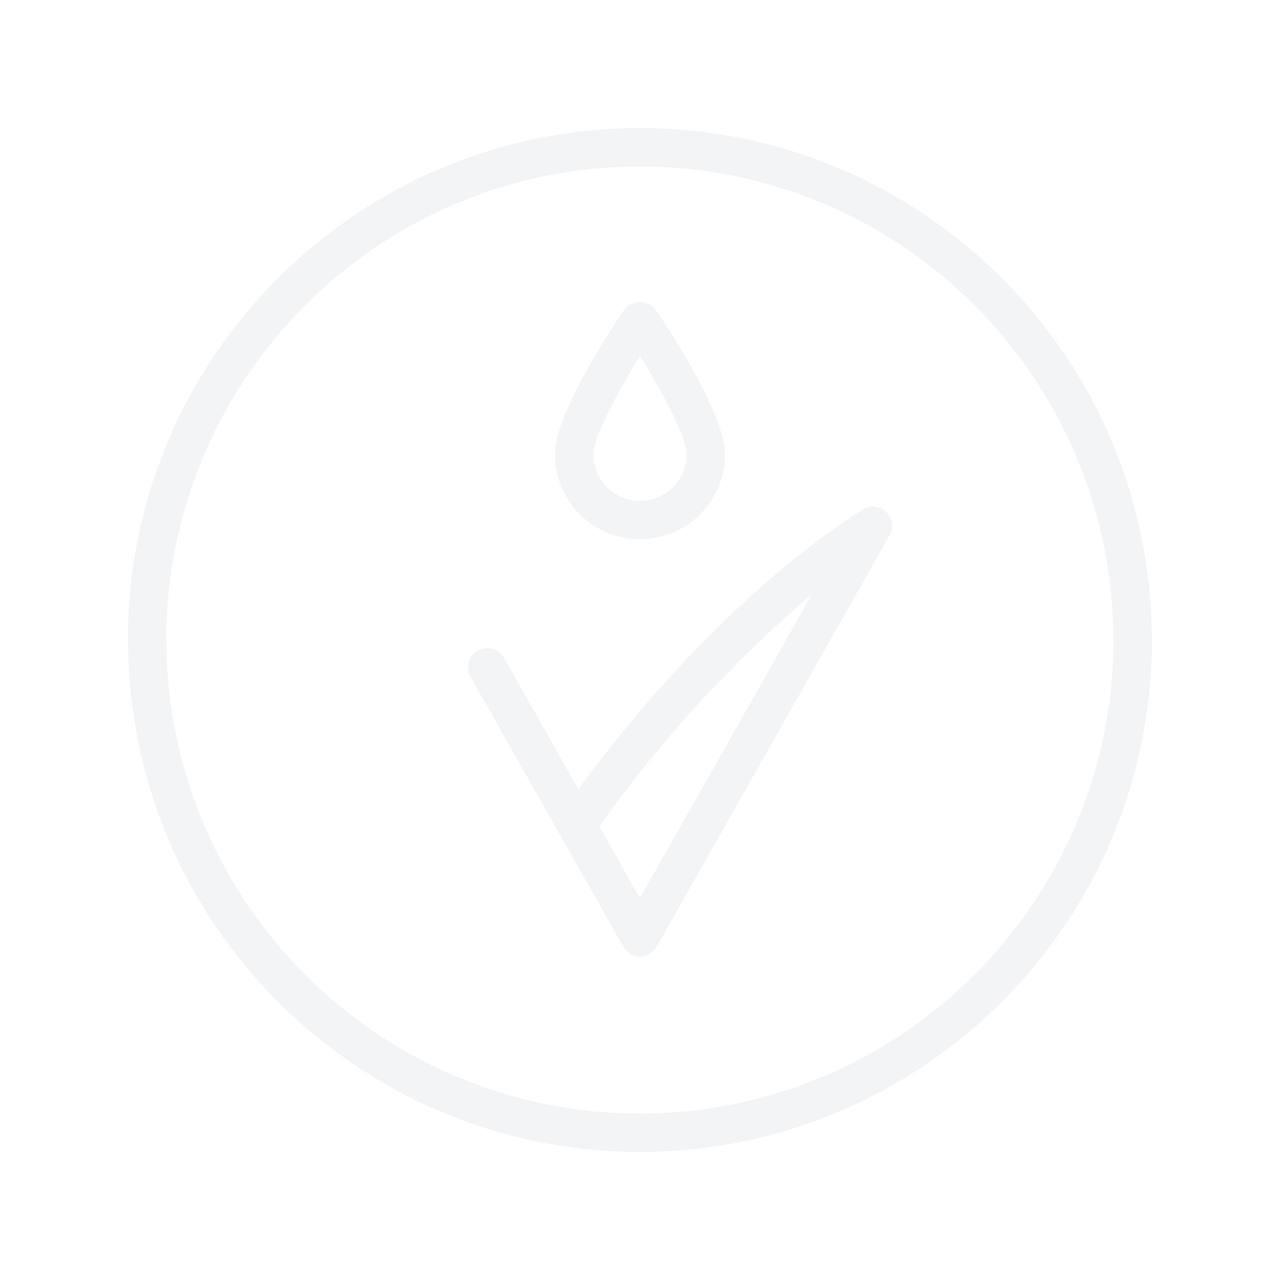 SESDERMA Azelac Facial Moisturizing Cream 50ml